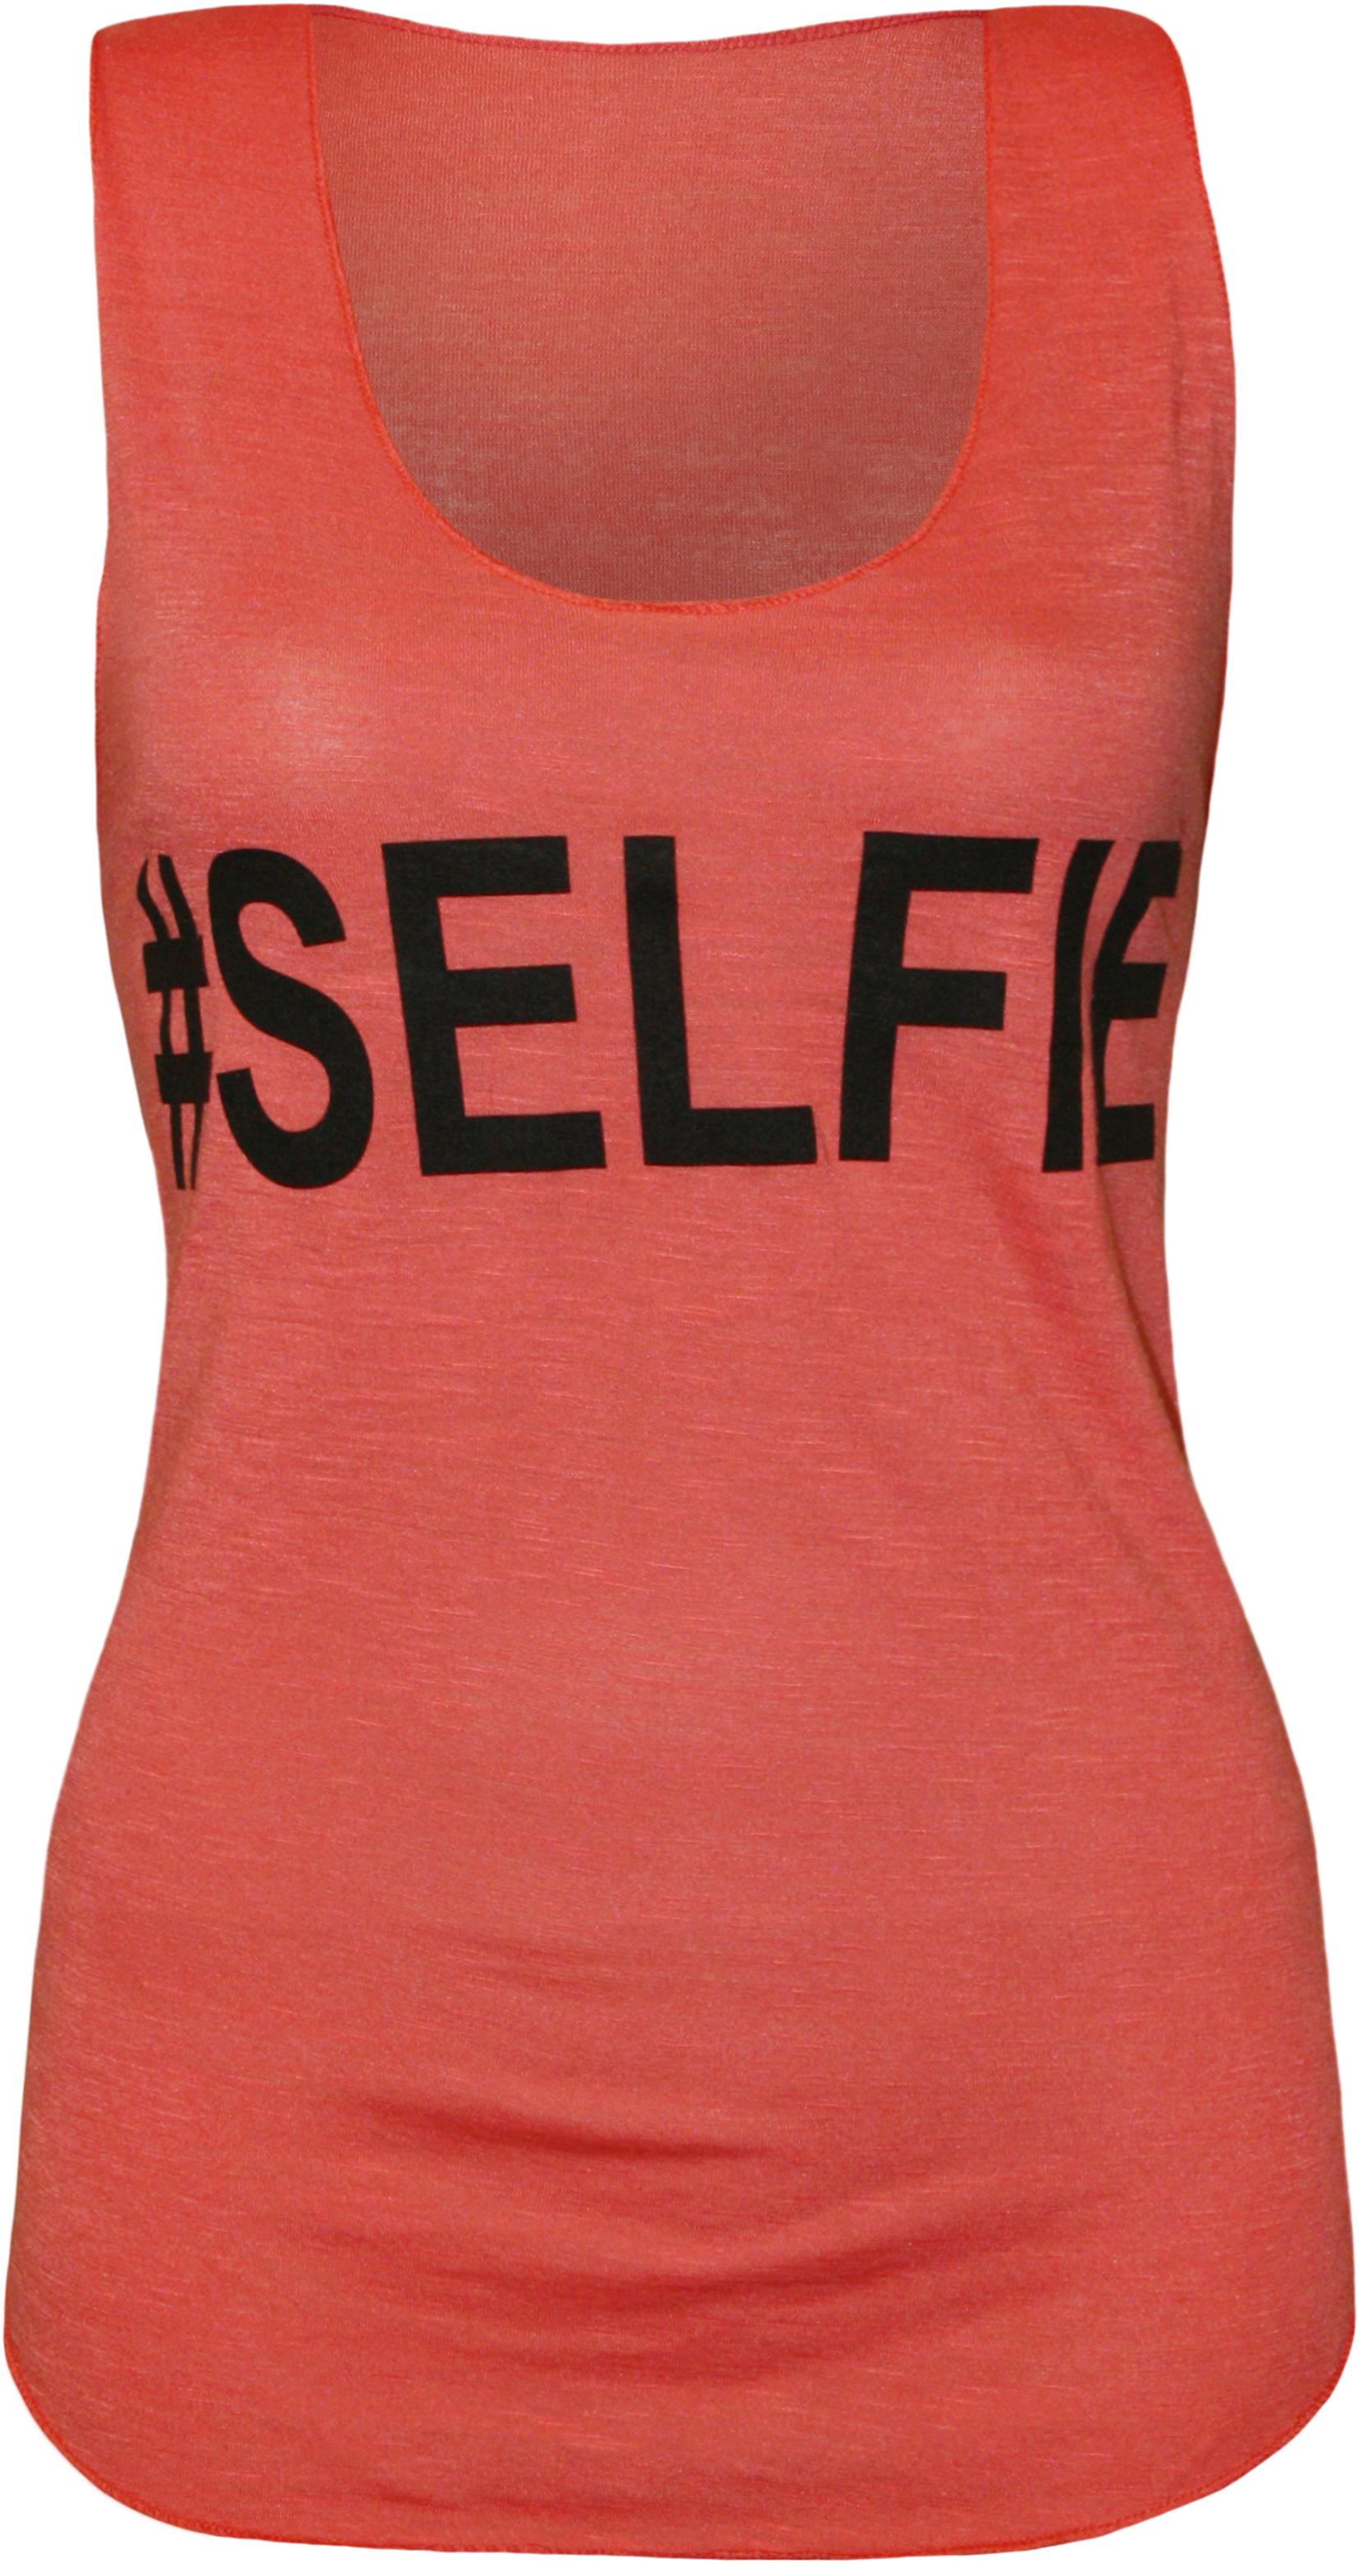 ... -Selfie-Text-Slogan-Print-Ladies-Sleeveless-Vest-T-Shirt-Top-8-14